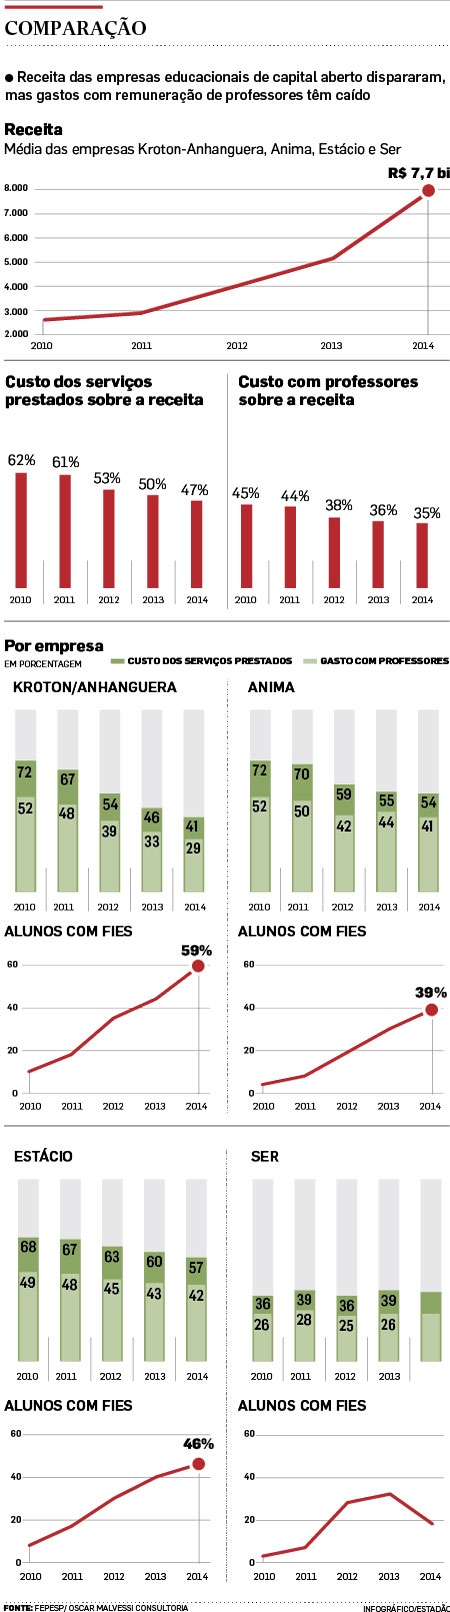 Fonte: FEPESP/Oscar Malvessi Consultoria; Infografía: Estadão